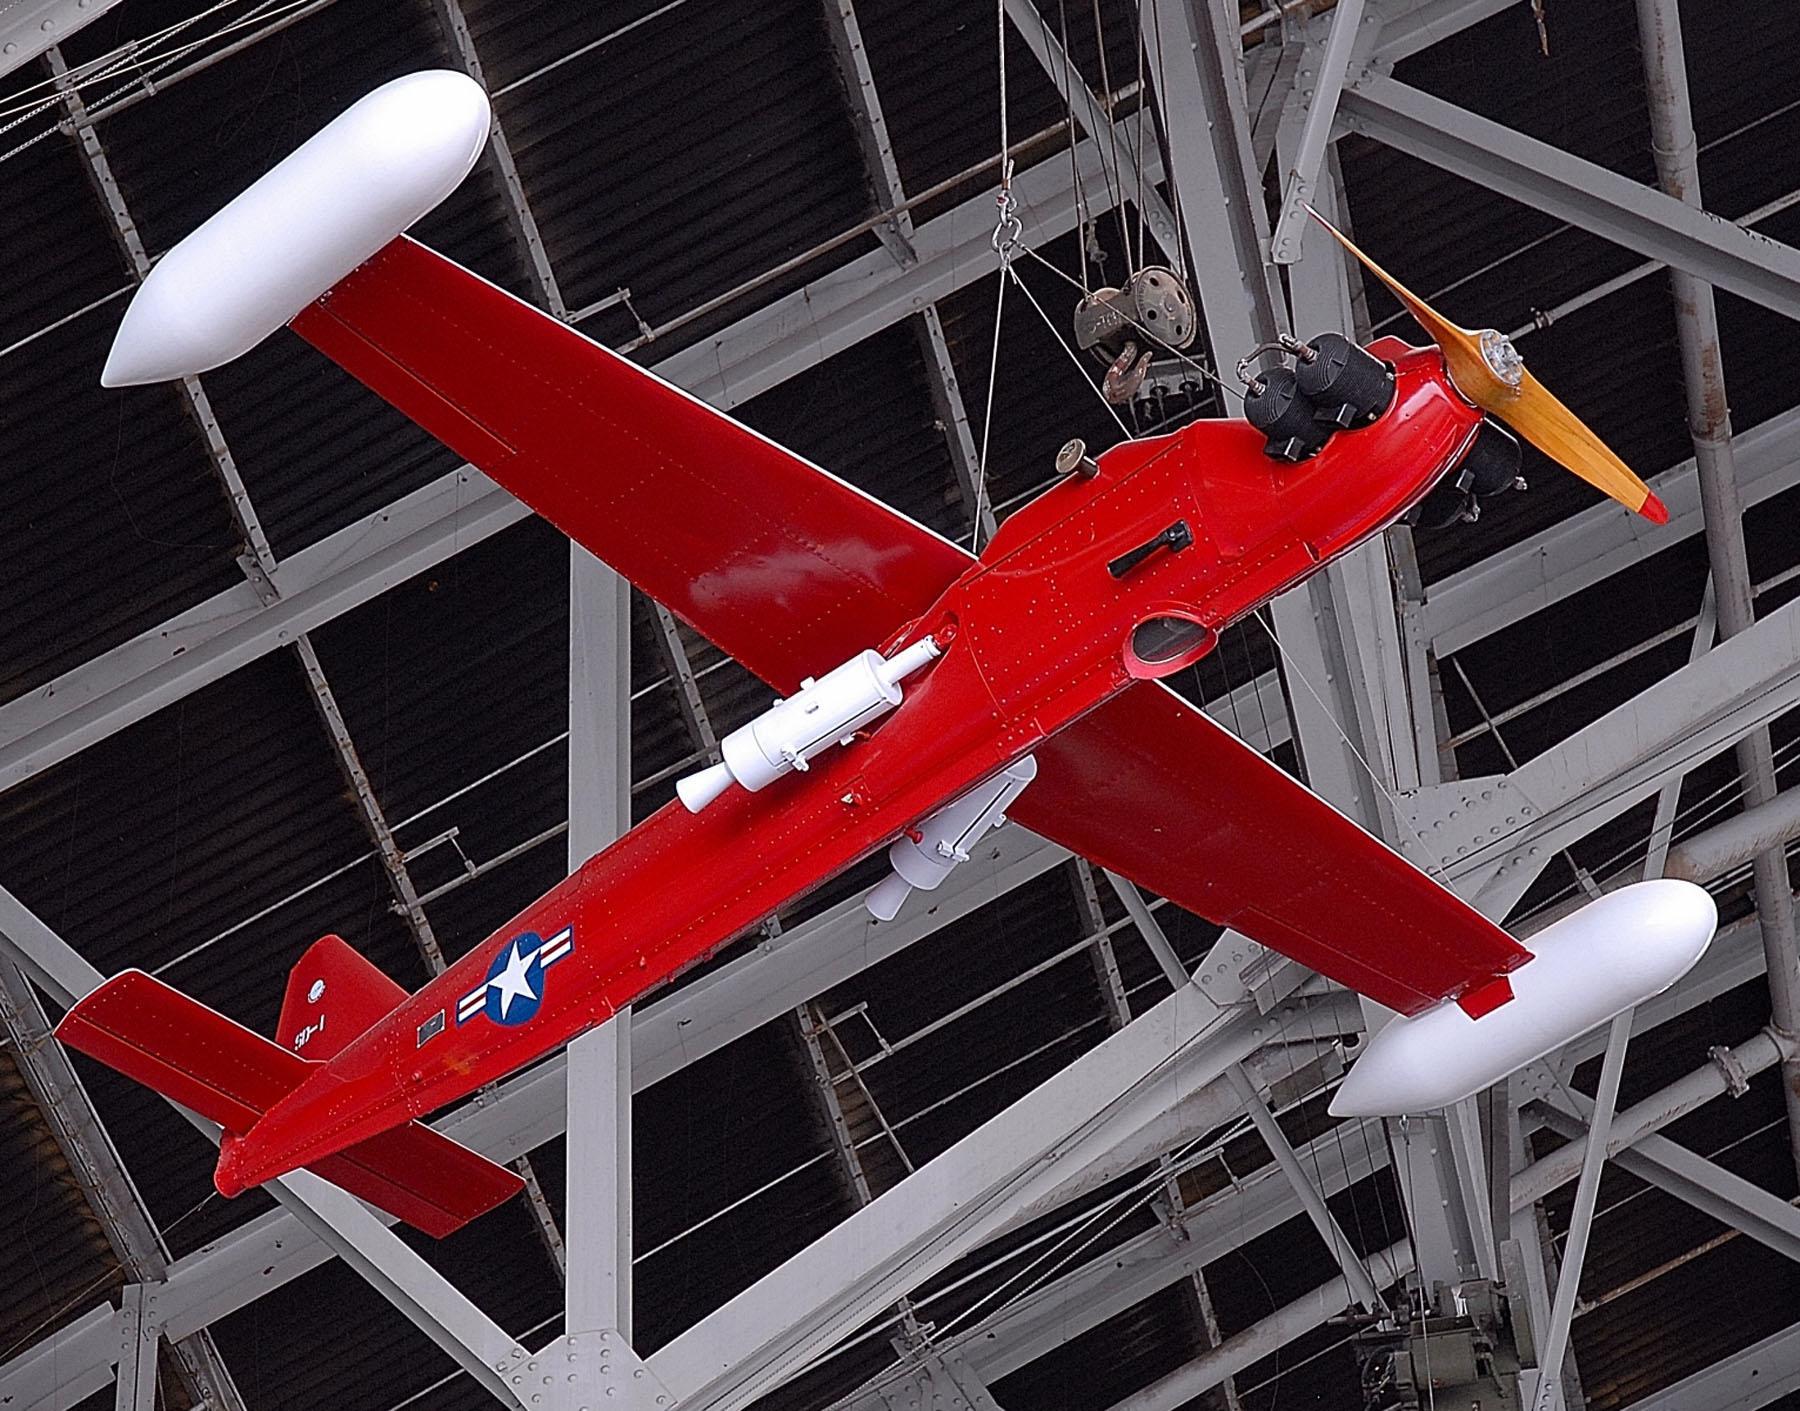 Radioplane/Northrop MQM-57 Falconer, National Museum of the United States Air Force, Dayton, Ohio. (U.S. Air Force photo)